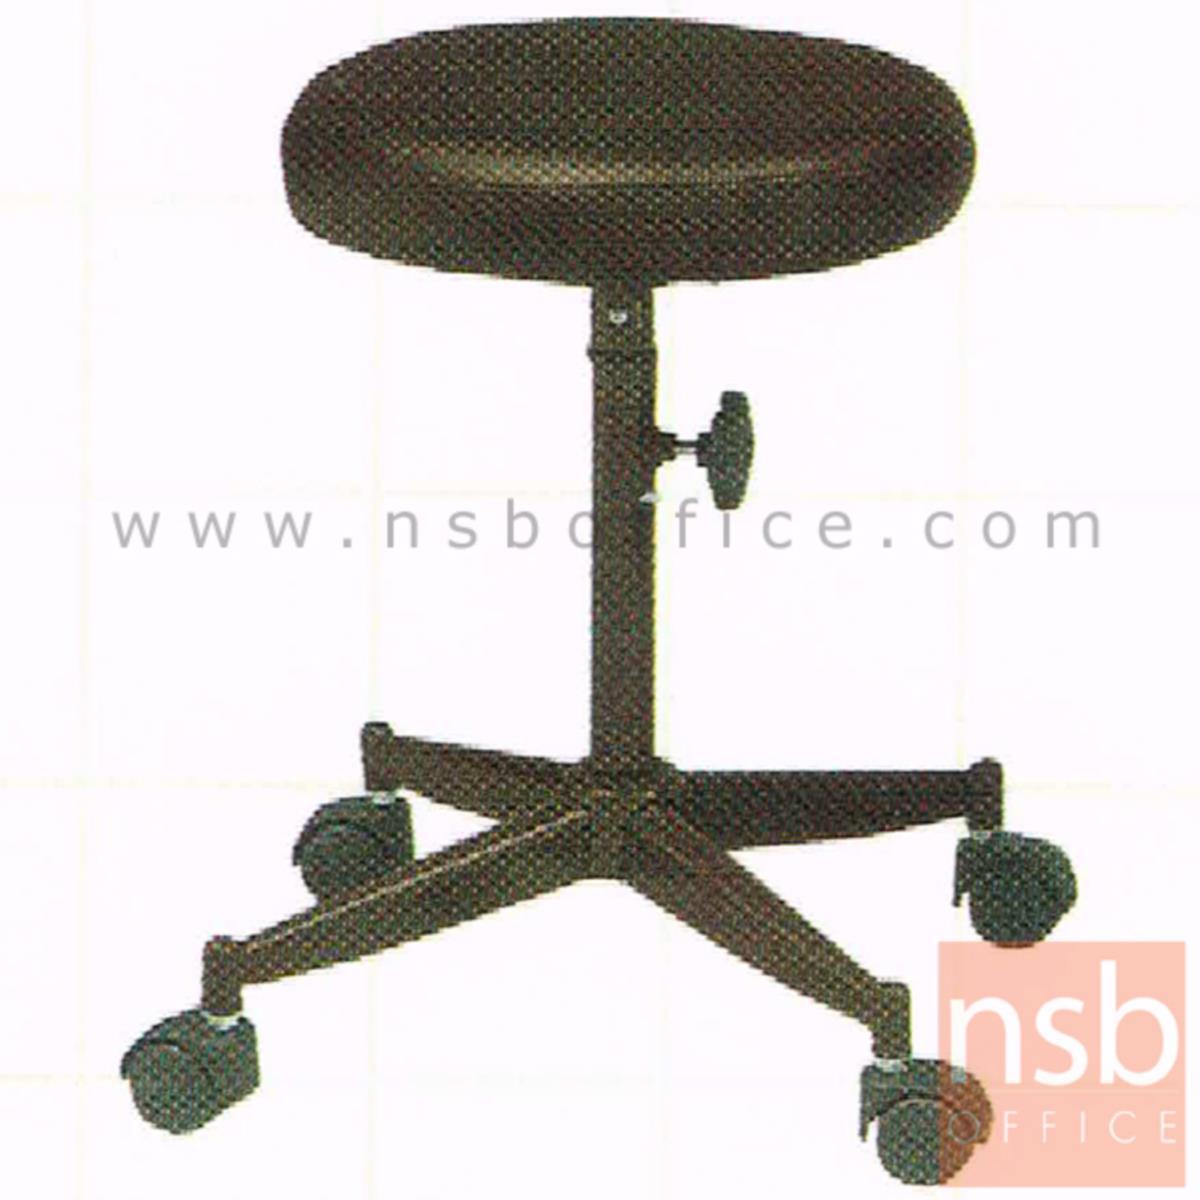 B02A080:เก้าอี้บาร์สตูลที่นั่งกลมล้อเลื่อน รุ่น Caroline (แคโรไลน์)  ขาเหล็ก